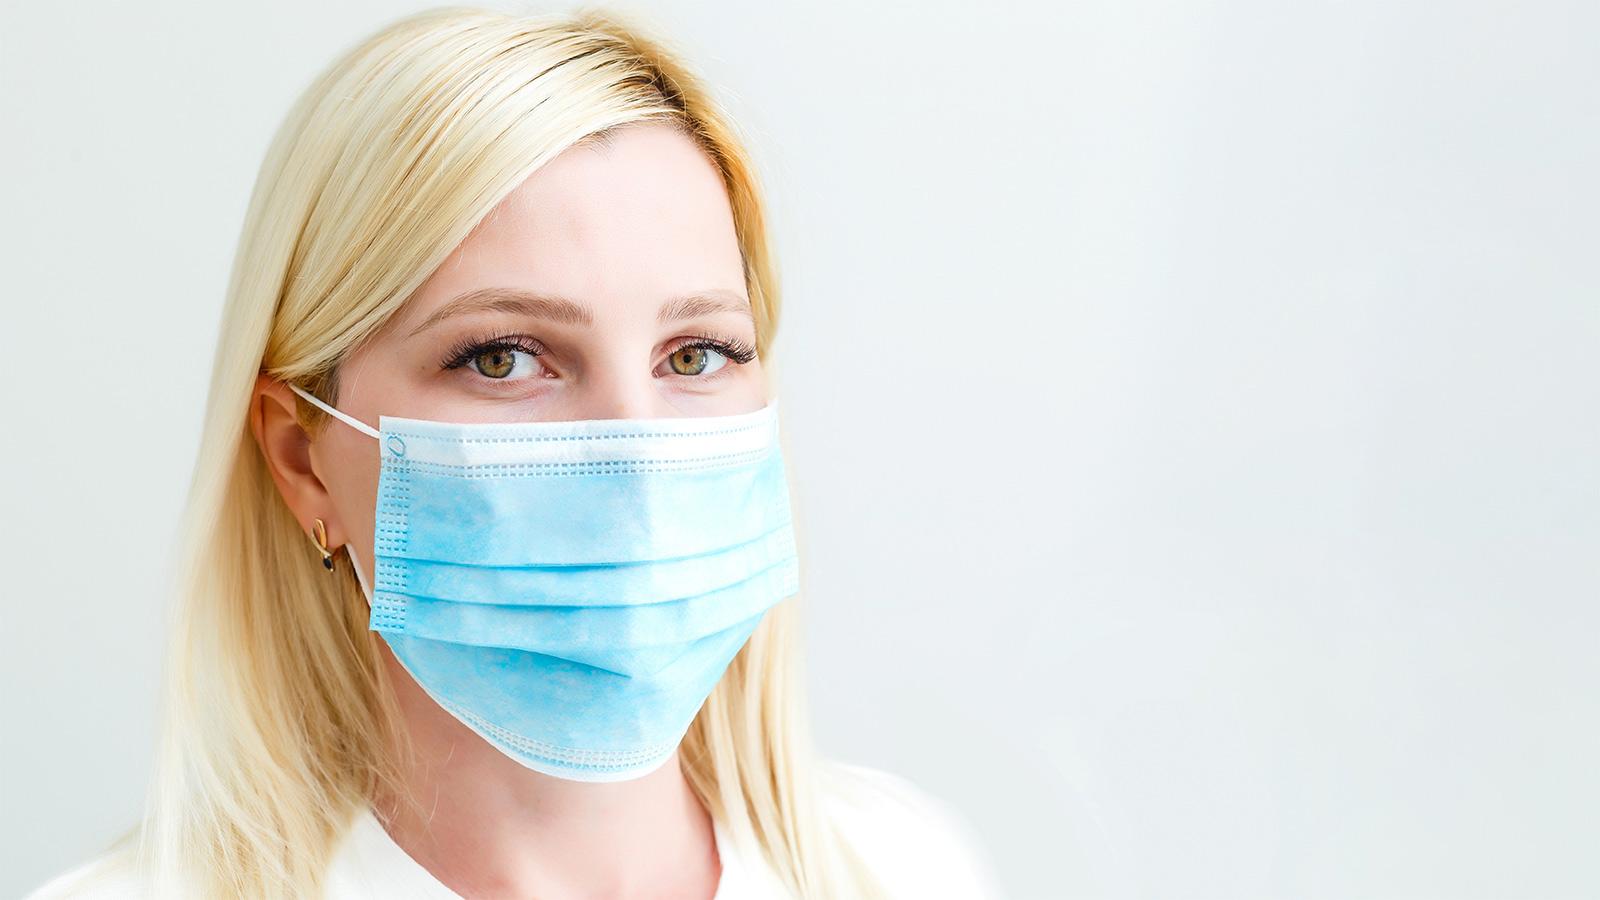 Mascarillas ¿sirven de algo contra coronavirus?   OCU